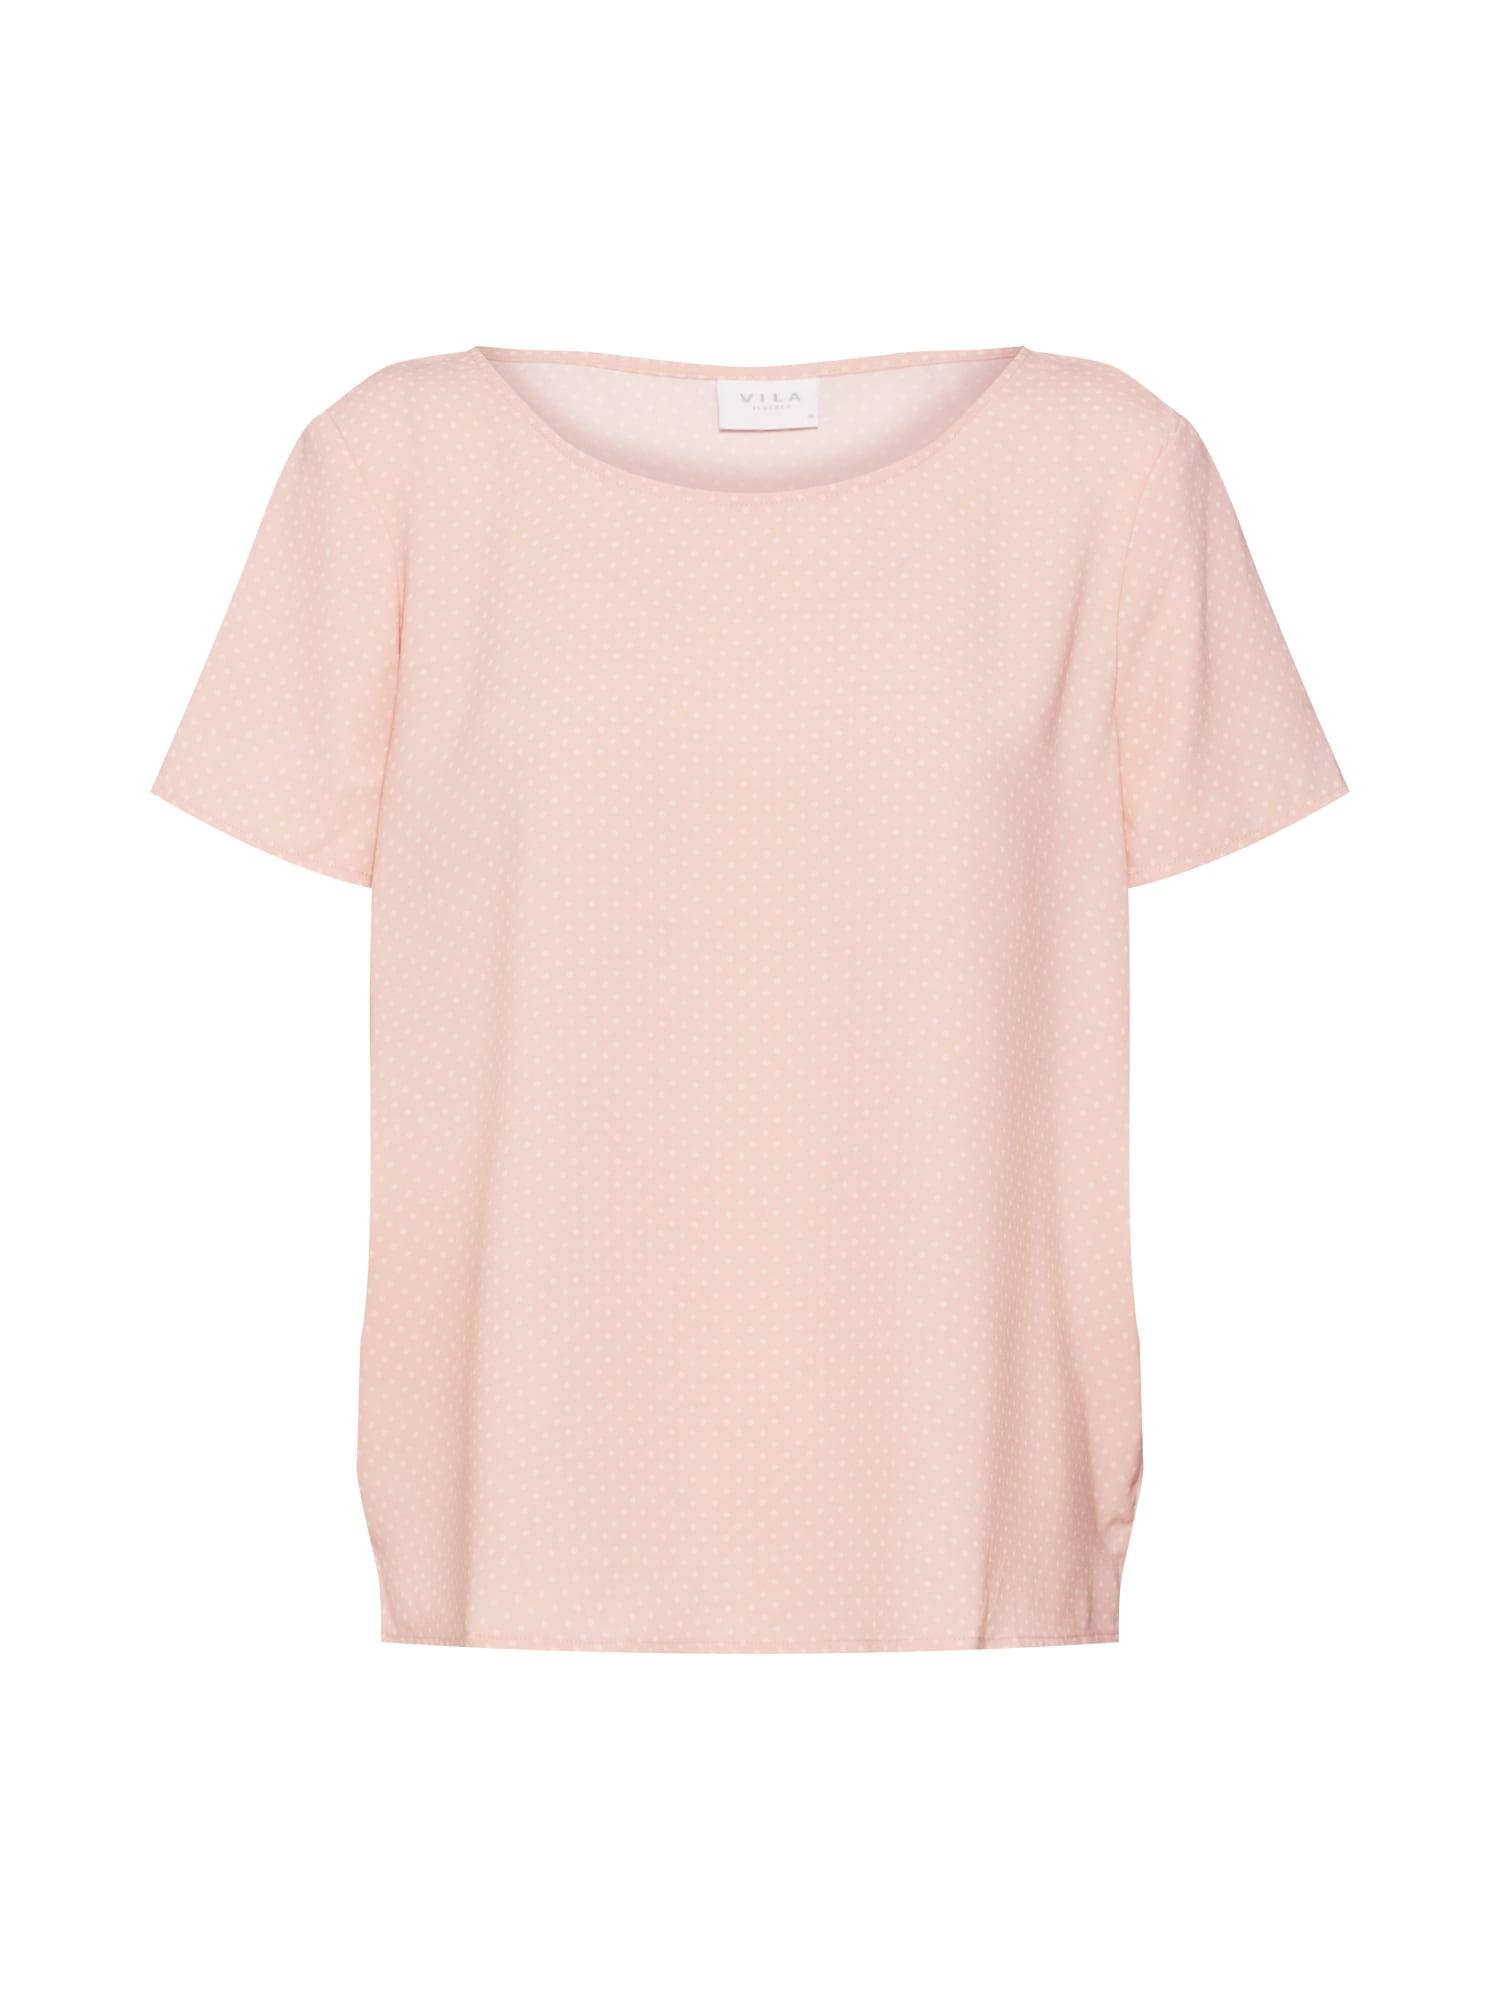 Tričko Laia rosé VILA